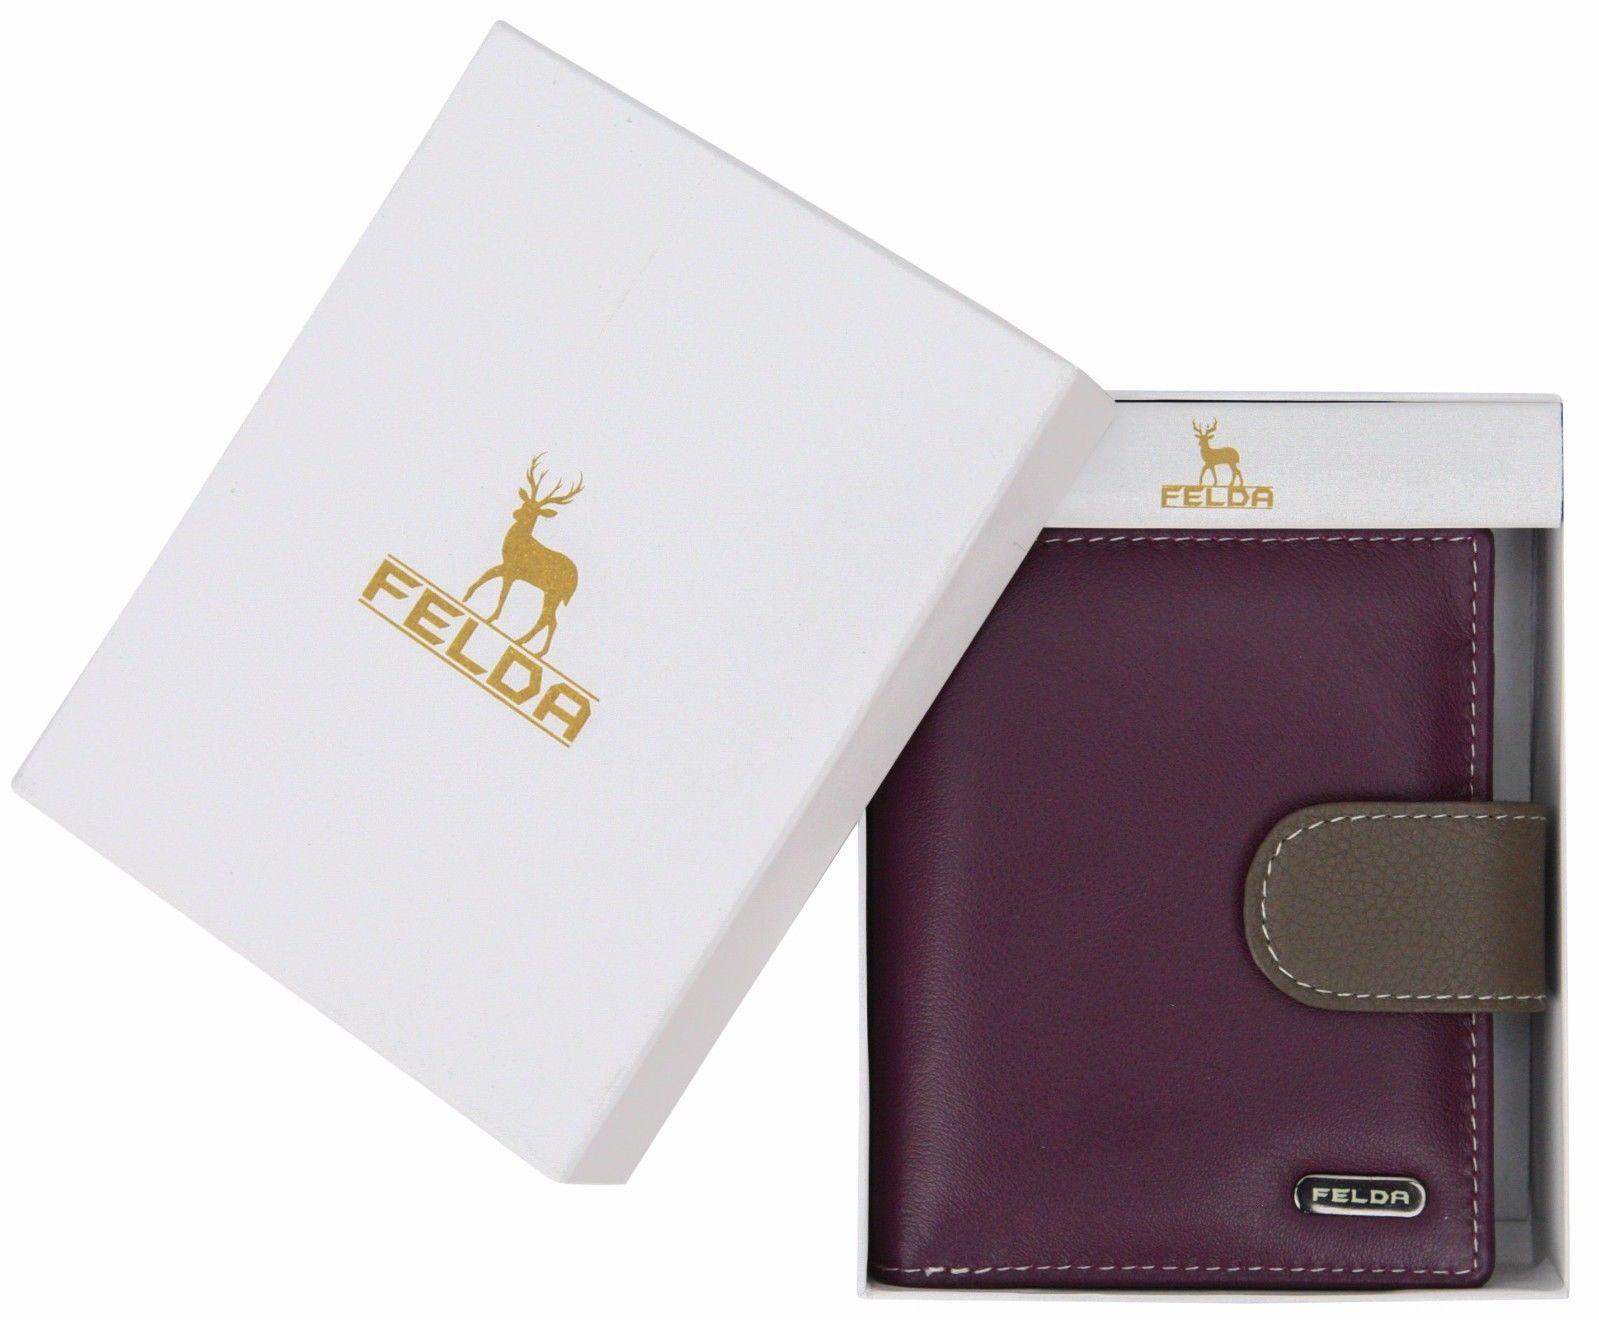 Felda-RFID-onorevoli-MEDAGLIA-amp-Card-Purse-Wallet-Genuine-Leather-Multi-SOFT-BOX-REGALO miniatura 93